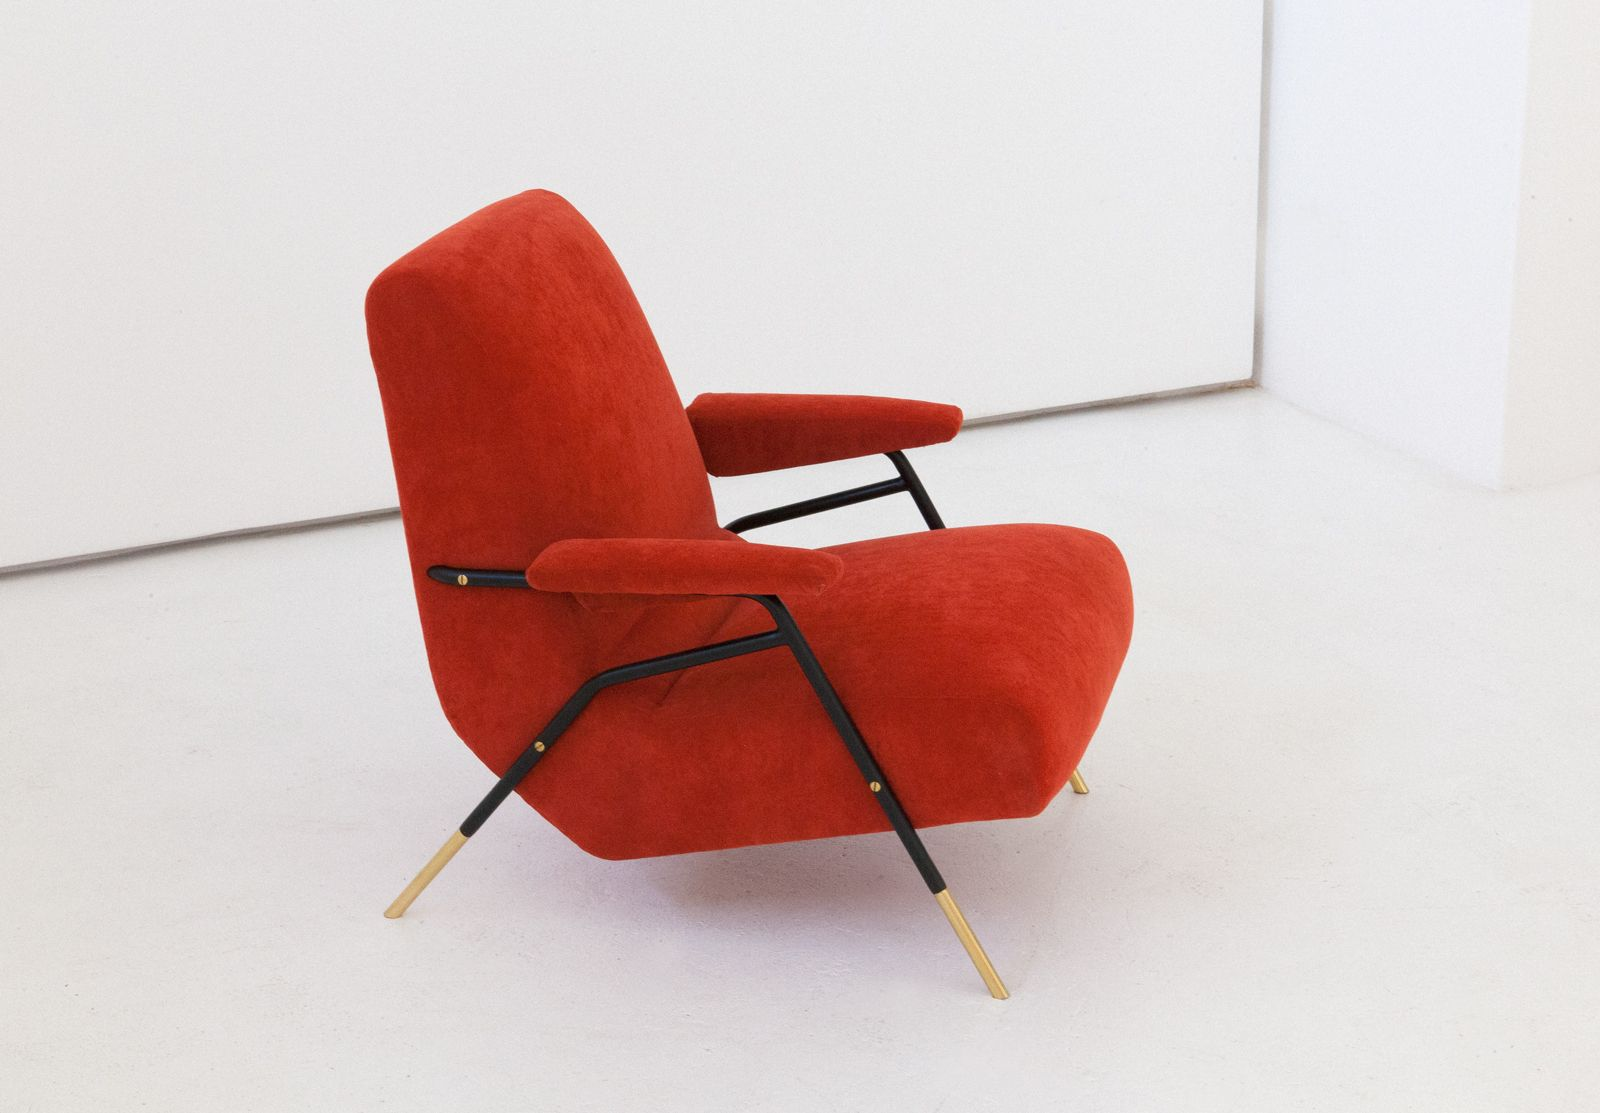 orange italienische mid century samt sessel mit rahmen aus. Black Bedroom Furniture Sets. Home Design Ideas